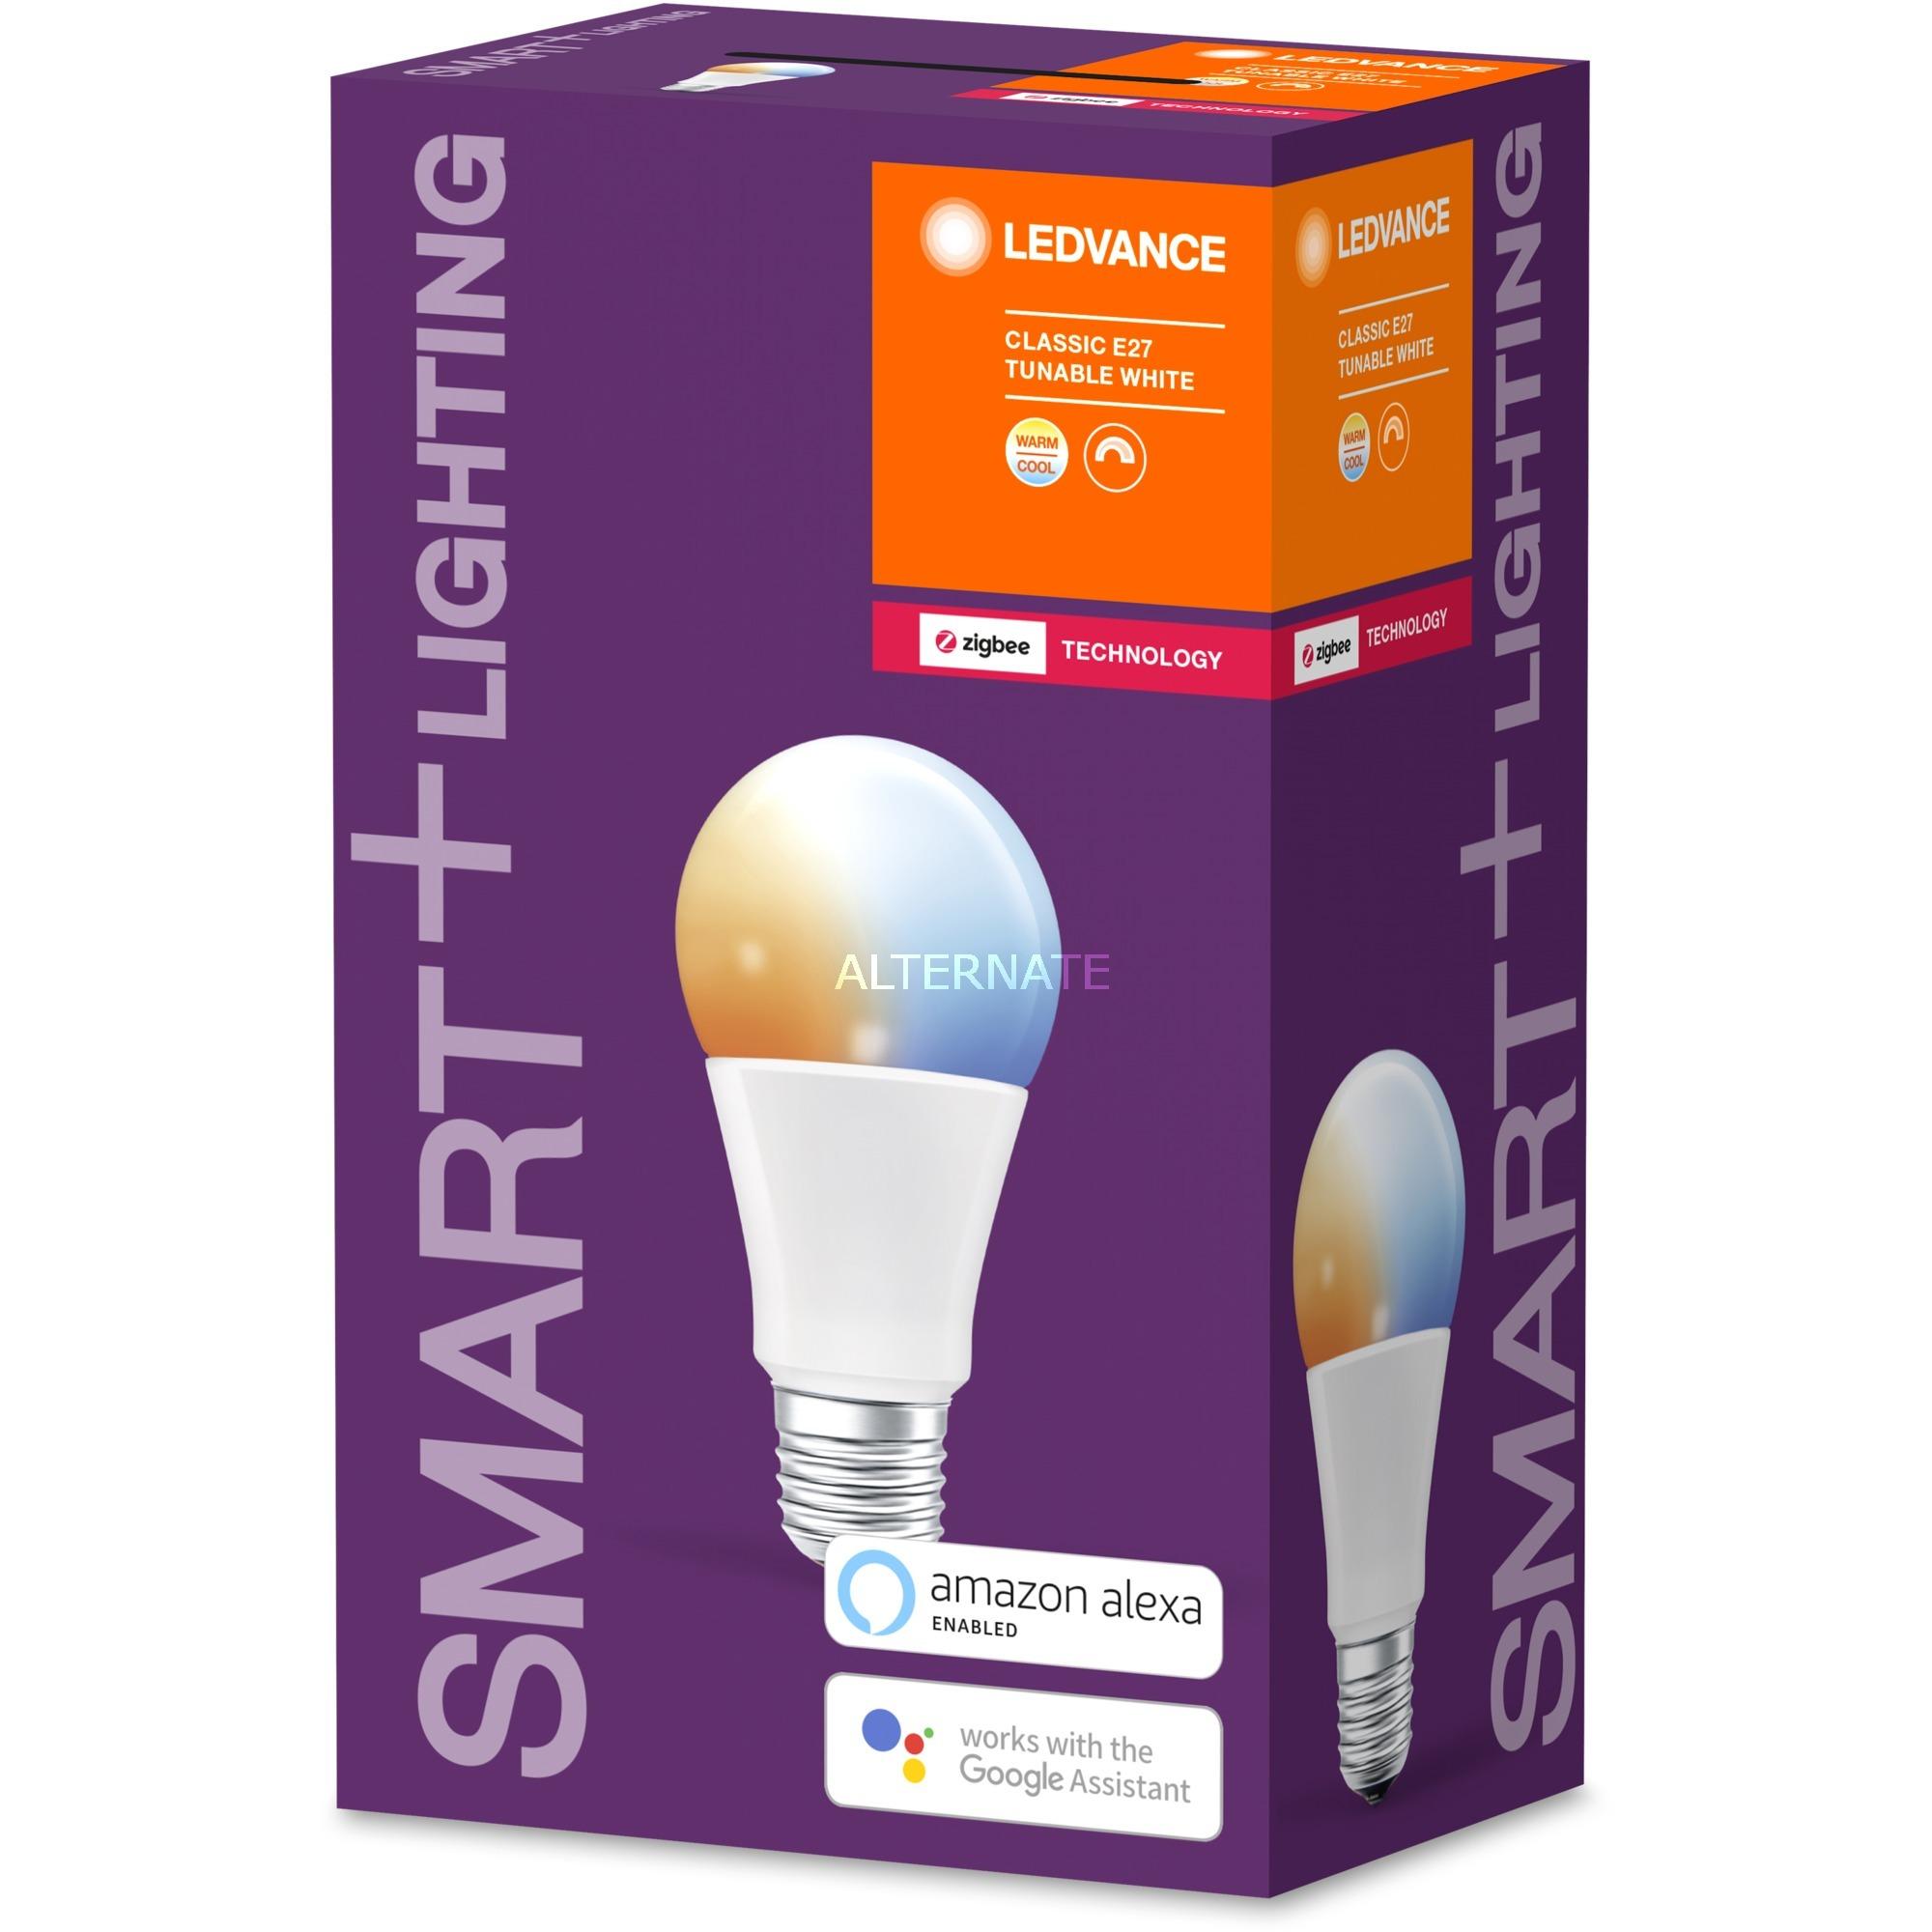 SMART+ Classic Tunable White Bombilla inteligente Blanco ZigBee 8,5 W, Lámpara LED